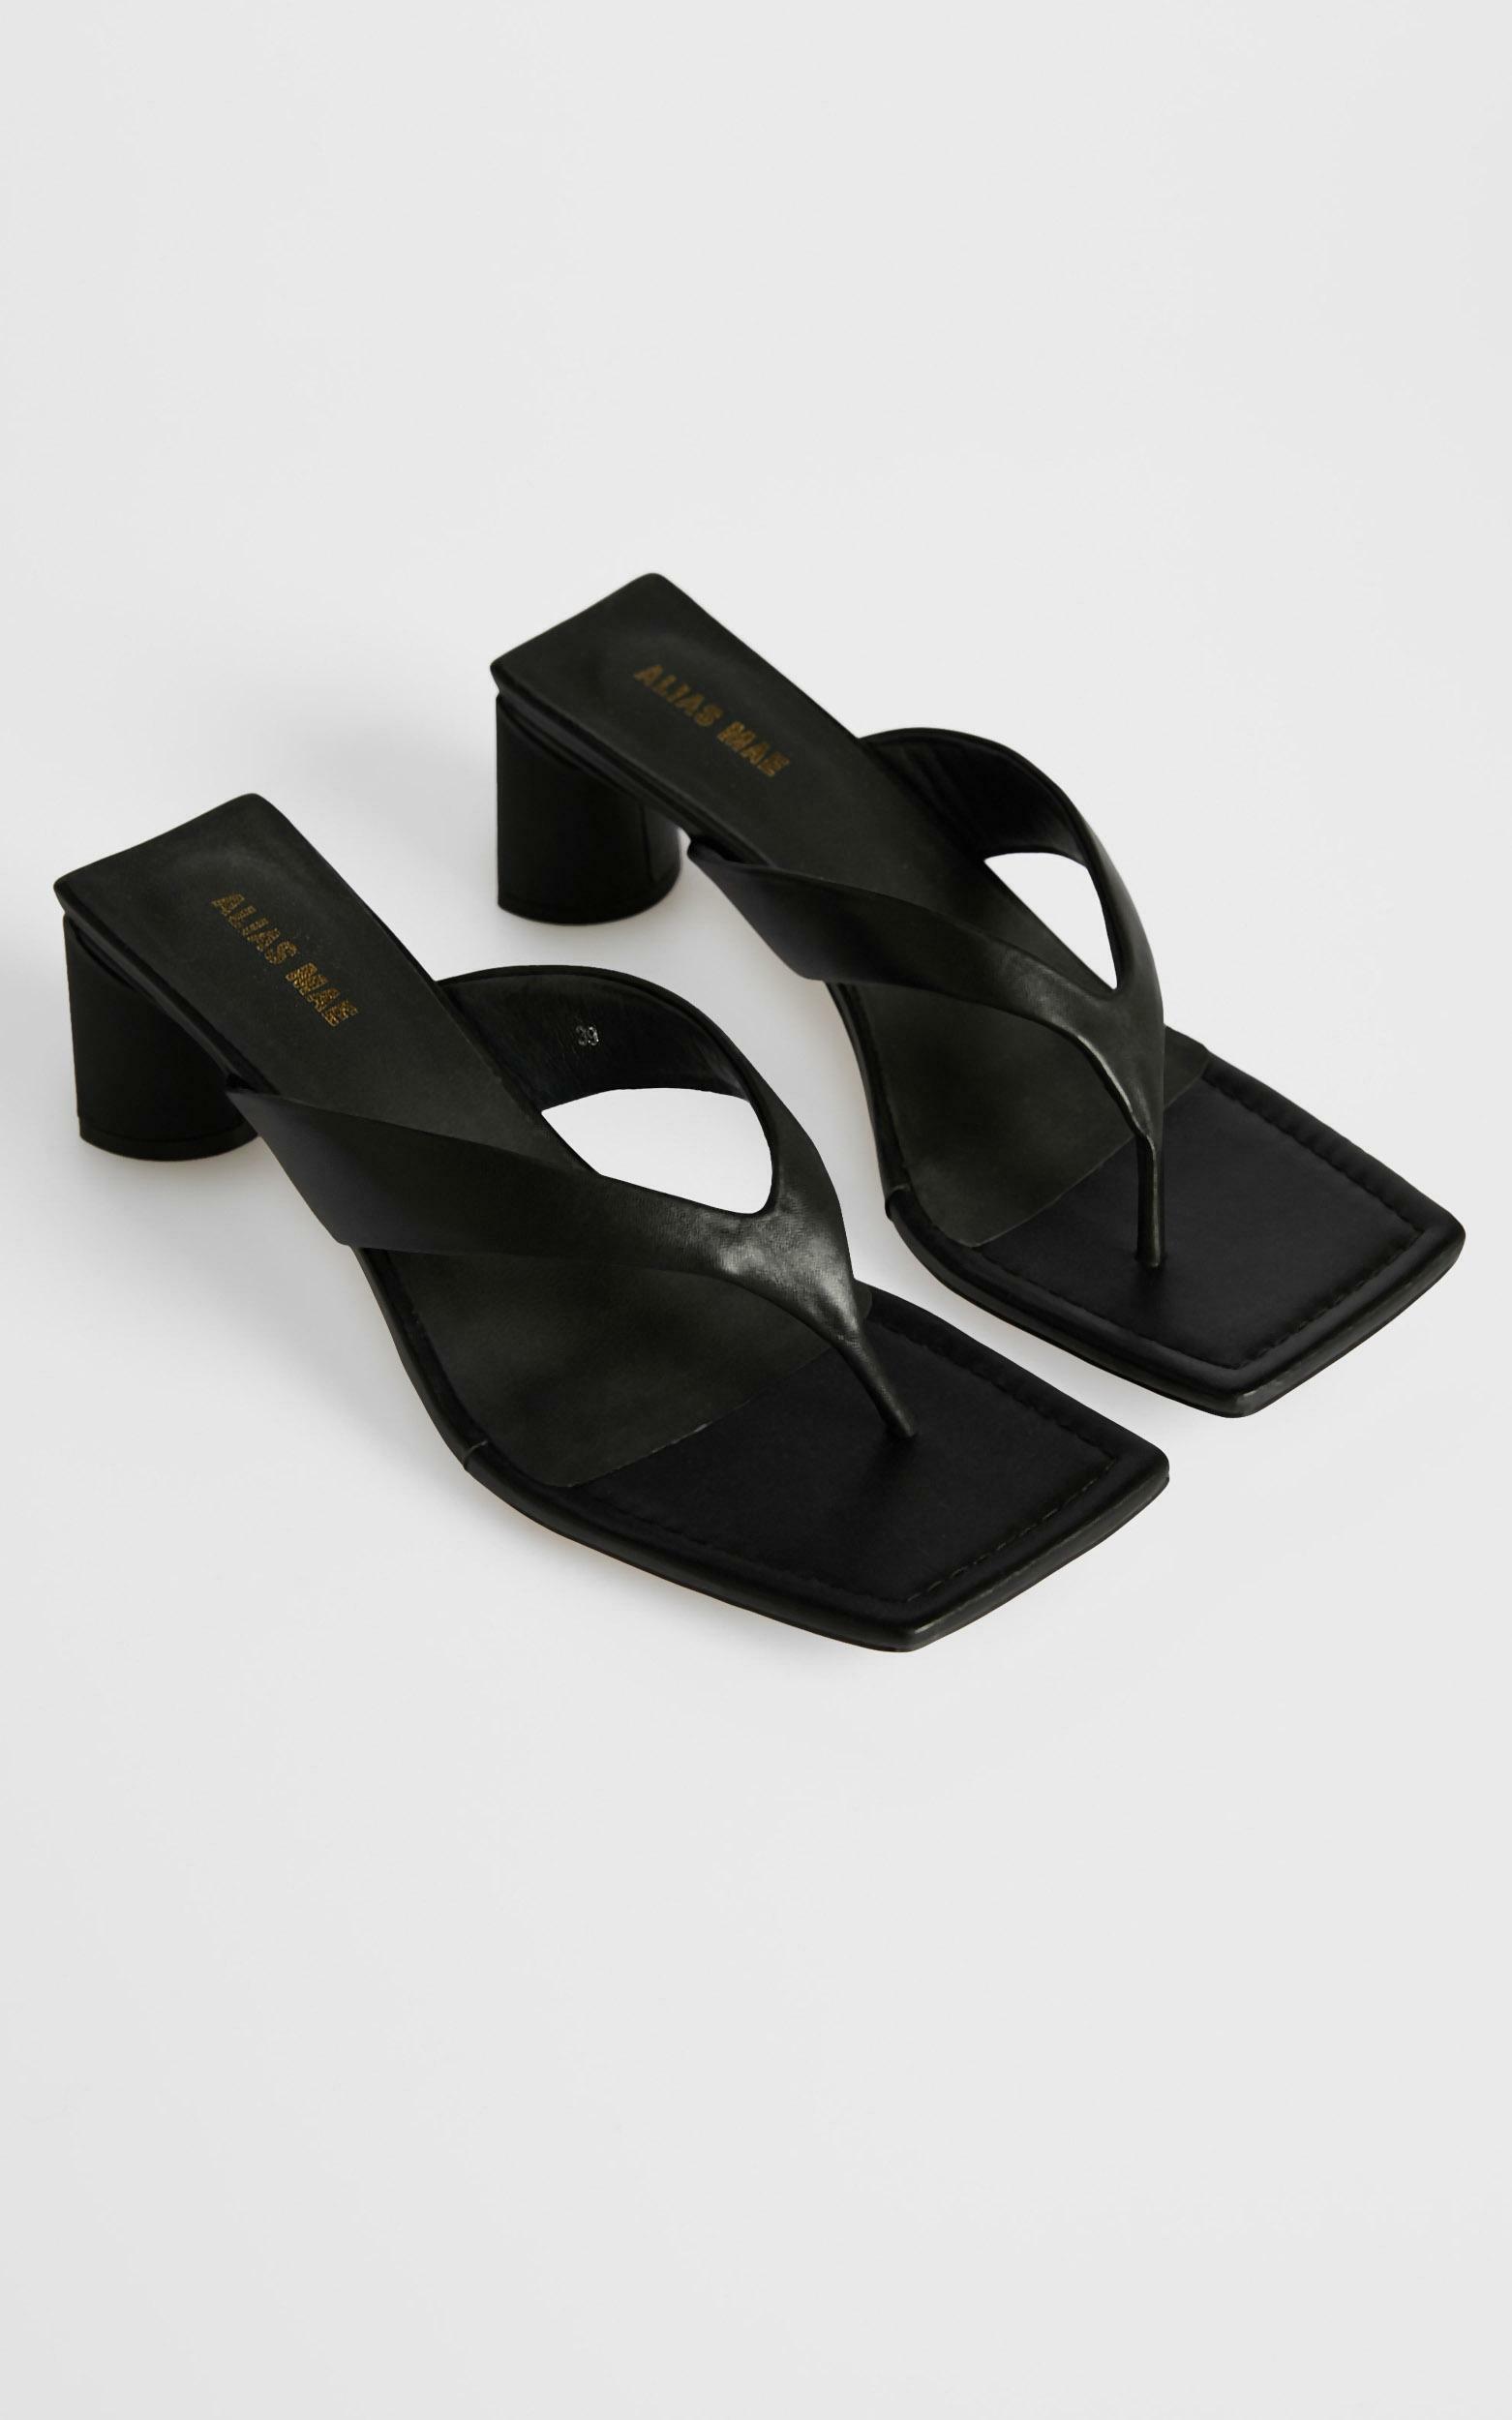 Alias Mae - Noah Sandals in Black Kid Leather - 5.5, Black, hi-res image number null